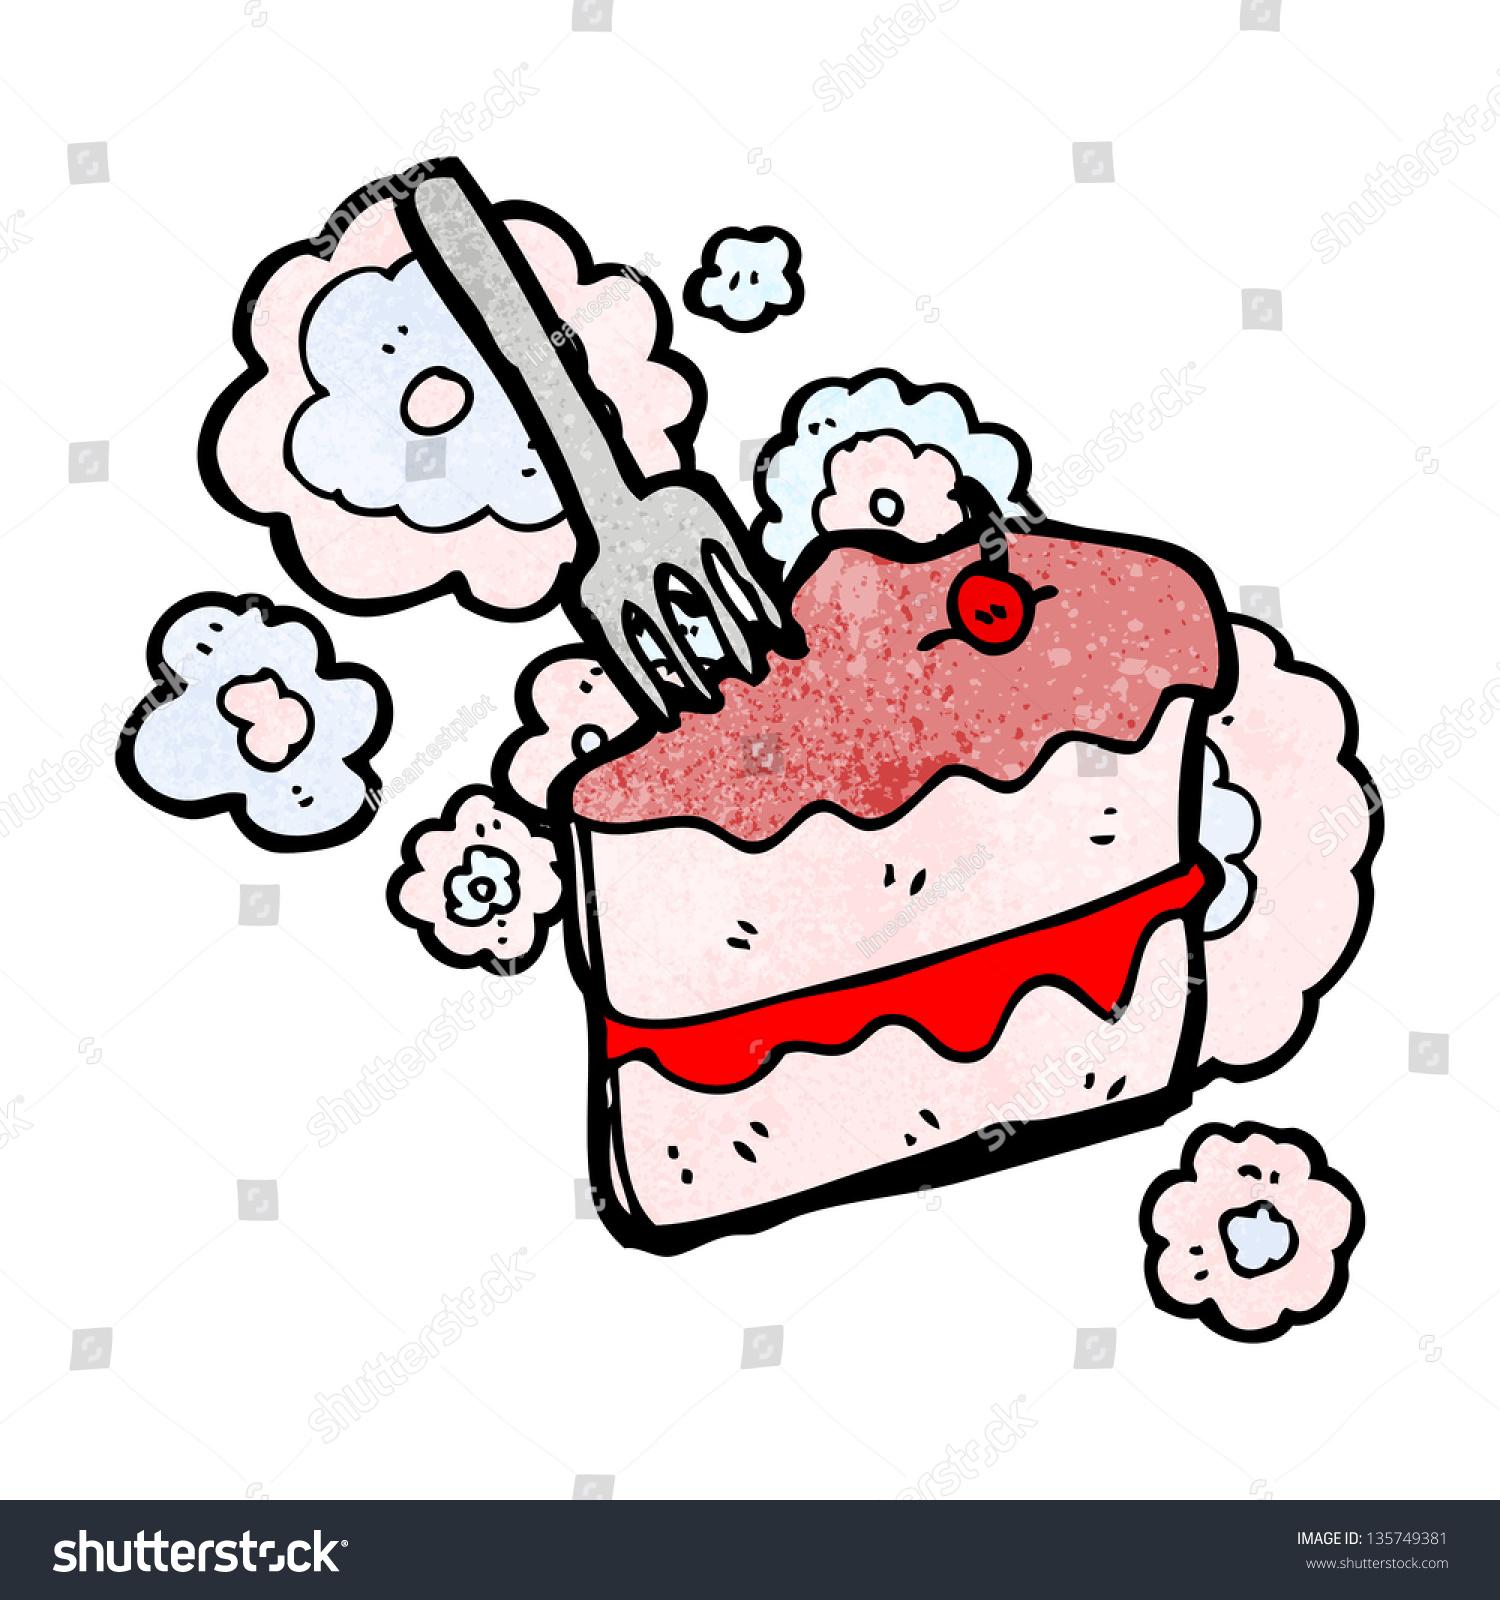 Cartoon Slice Cake Stock Illustration 135749381 - Shutterstock